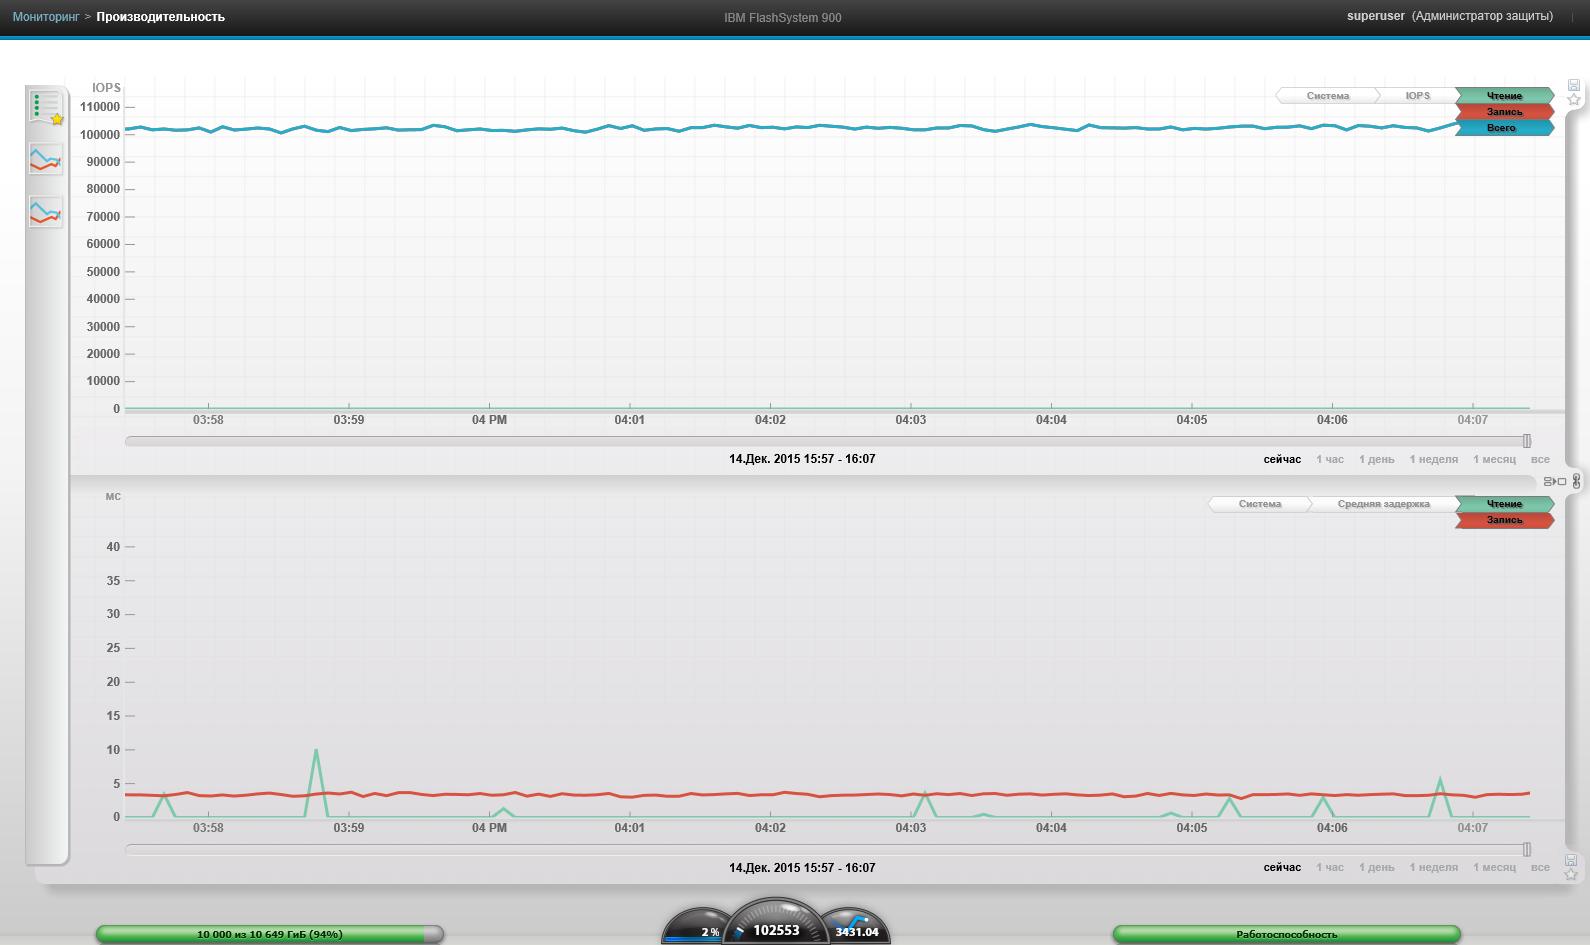 Обзор и тестирование флеш-хранилища от IBM FlashSystem 900 - 19